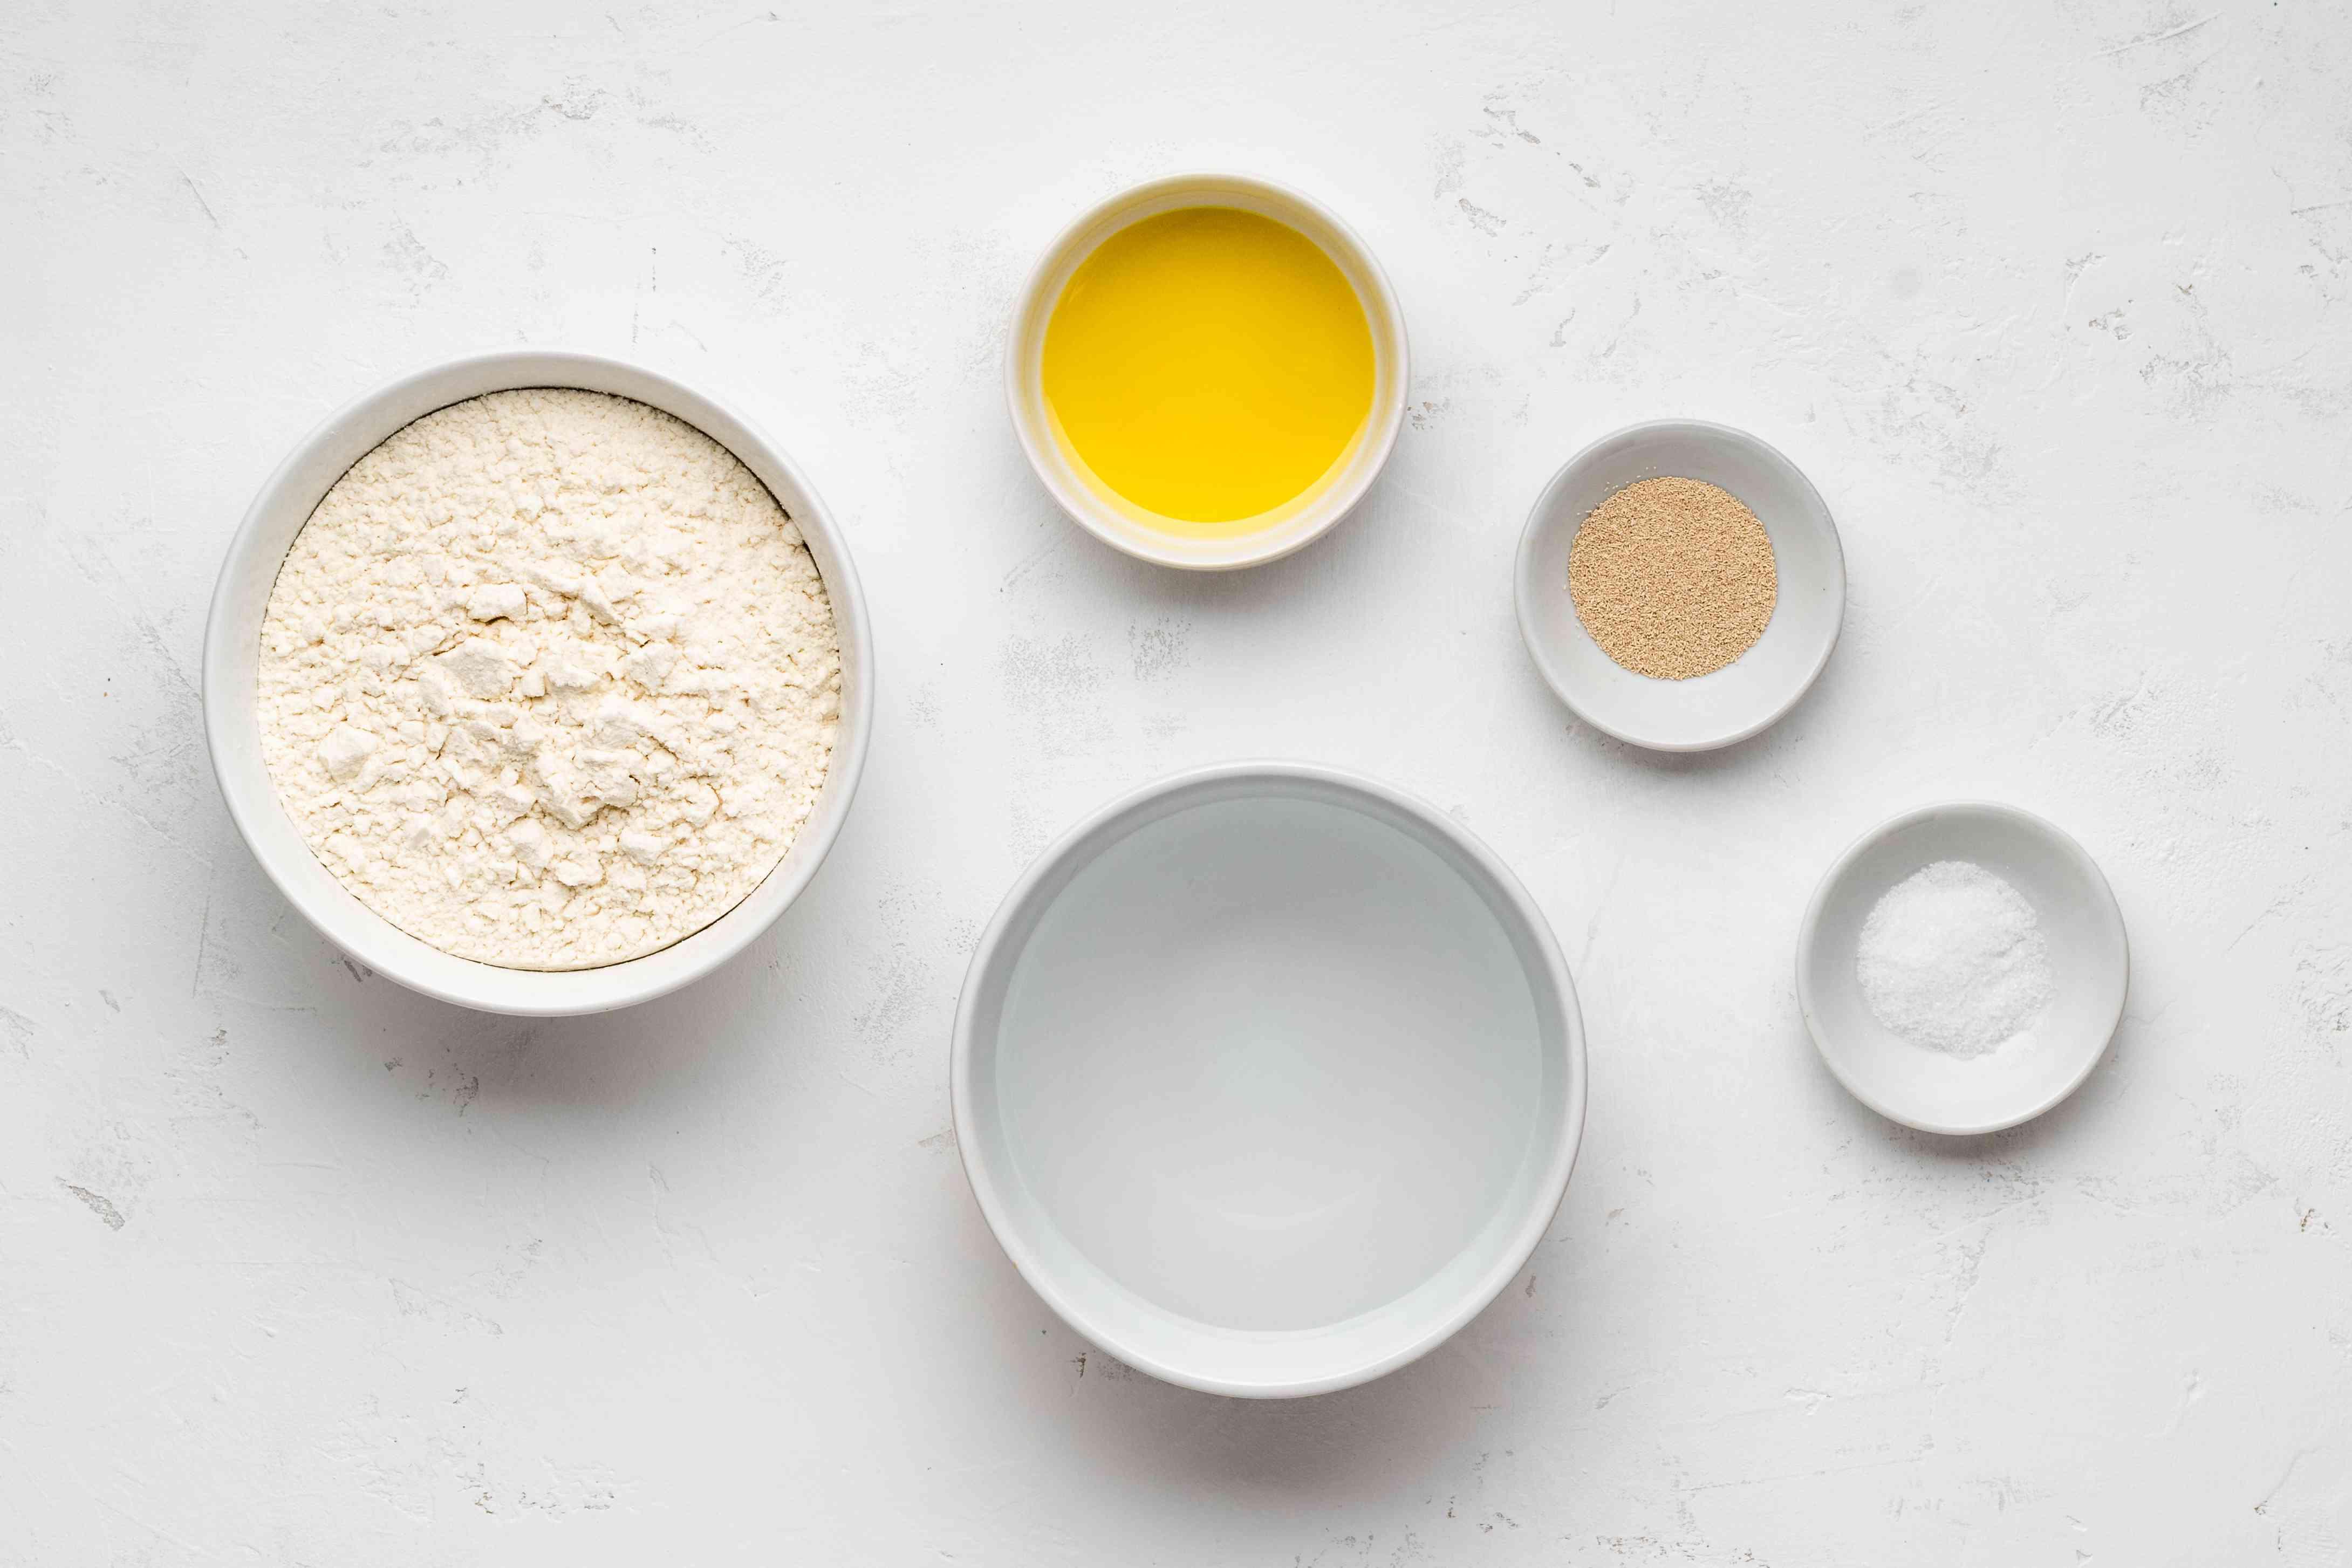 Homemade Turkish lahmacun ingredients